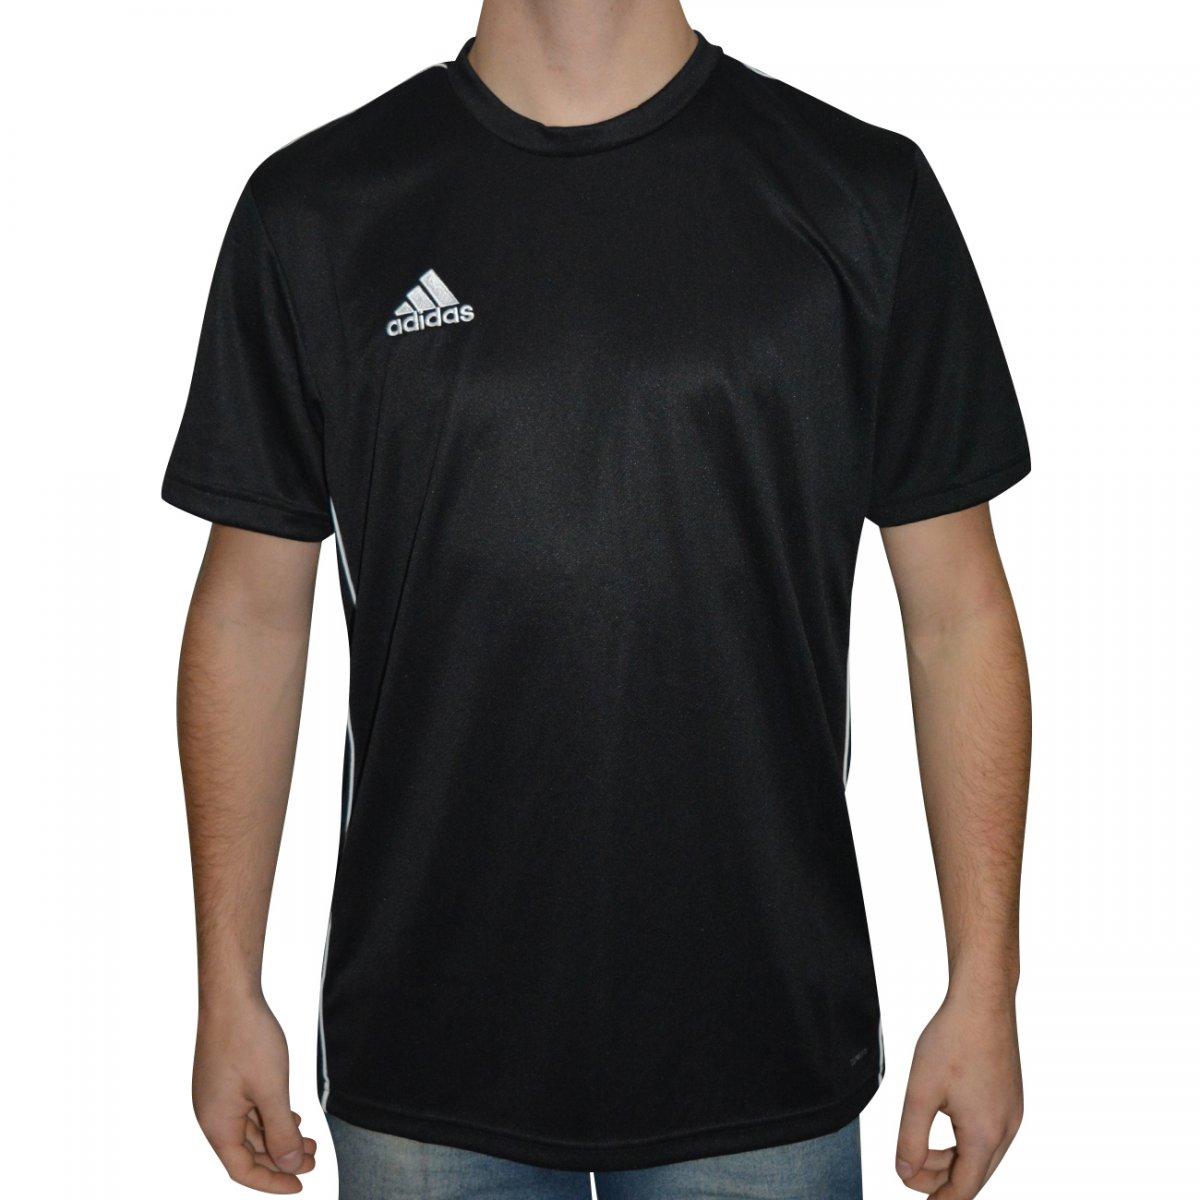 Camiseta Adidas Core 18 CE9021 - Preto branco - Chuteira Nike ... 6e5d7dc6027